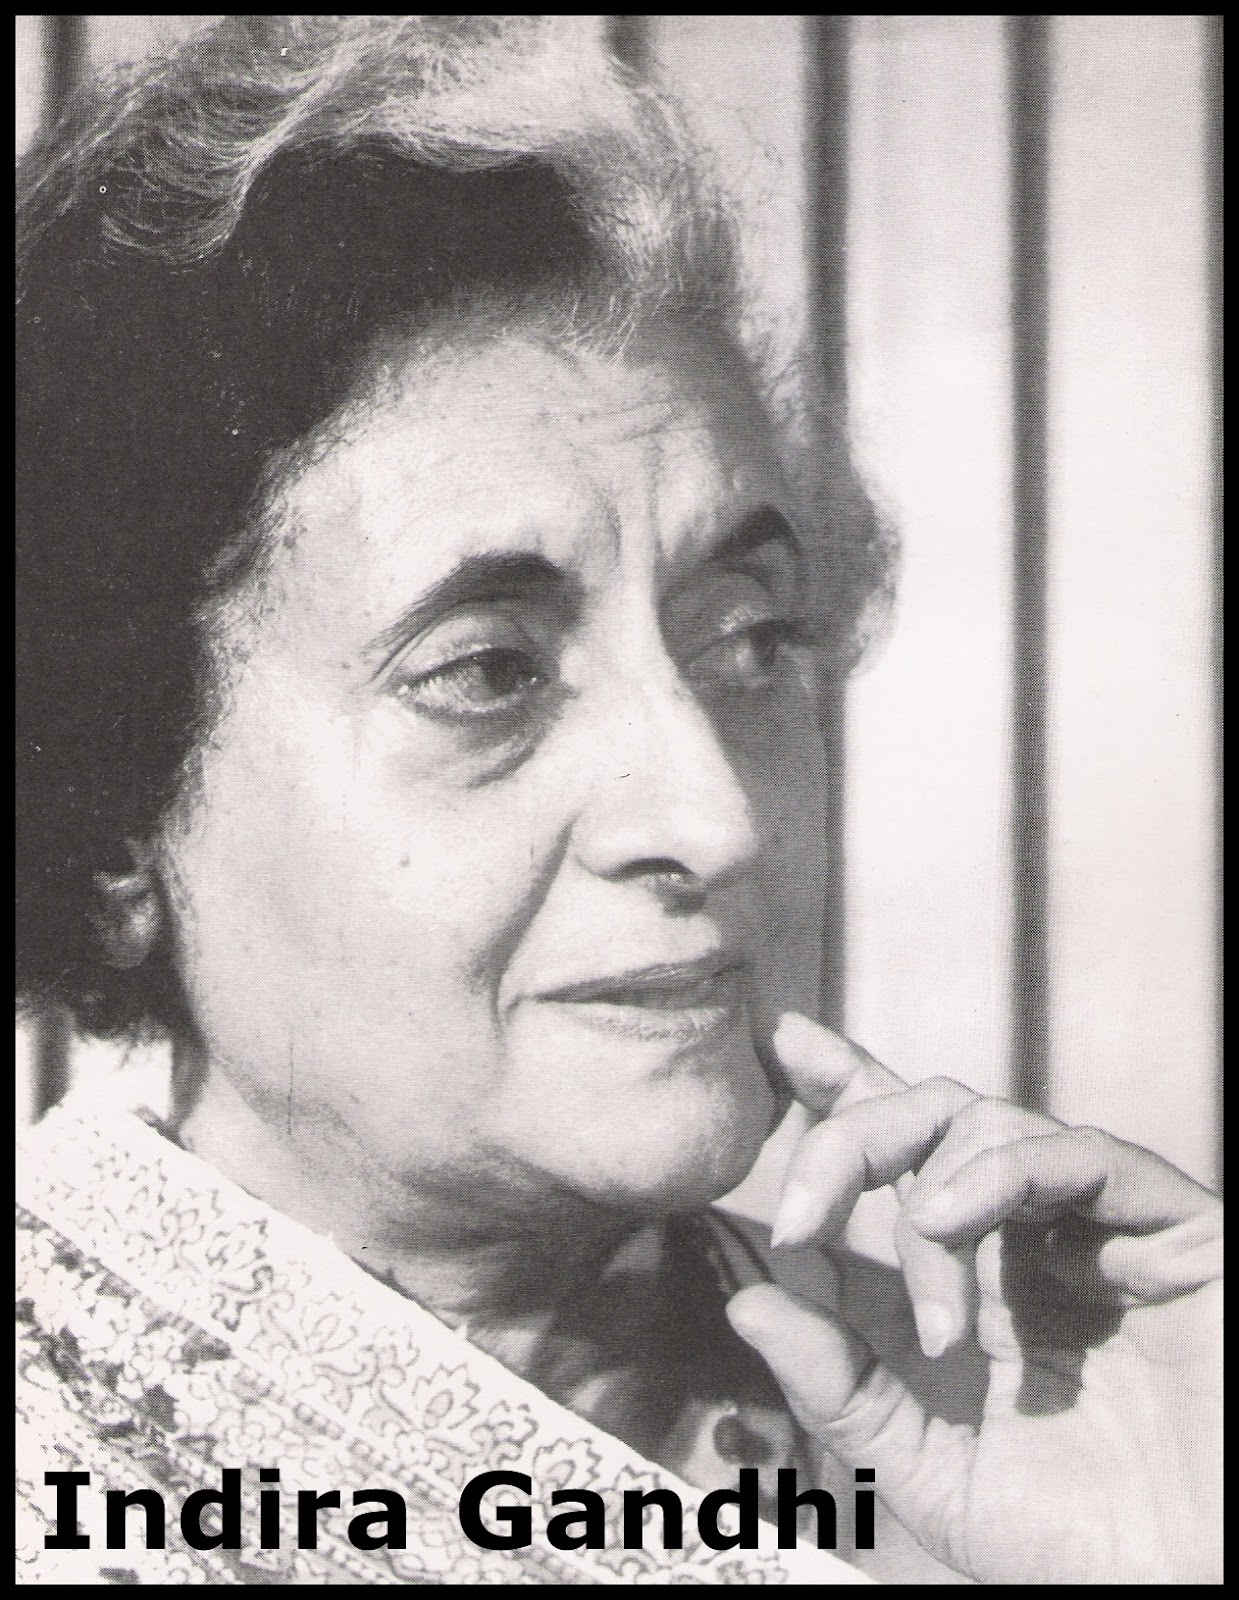 essay on indira gandhi indira gandhi essay help psychology  indira gandhi in hindi n prime minister indira indira gandhi in hindi indira gandhi images femalecelebrity